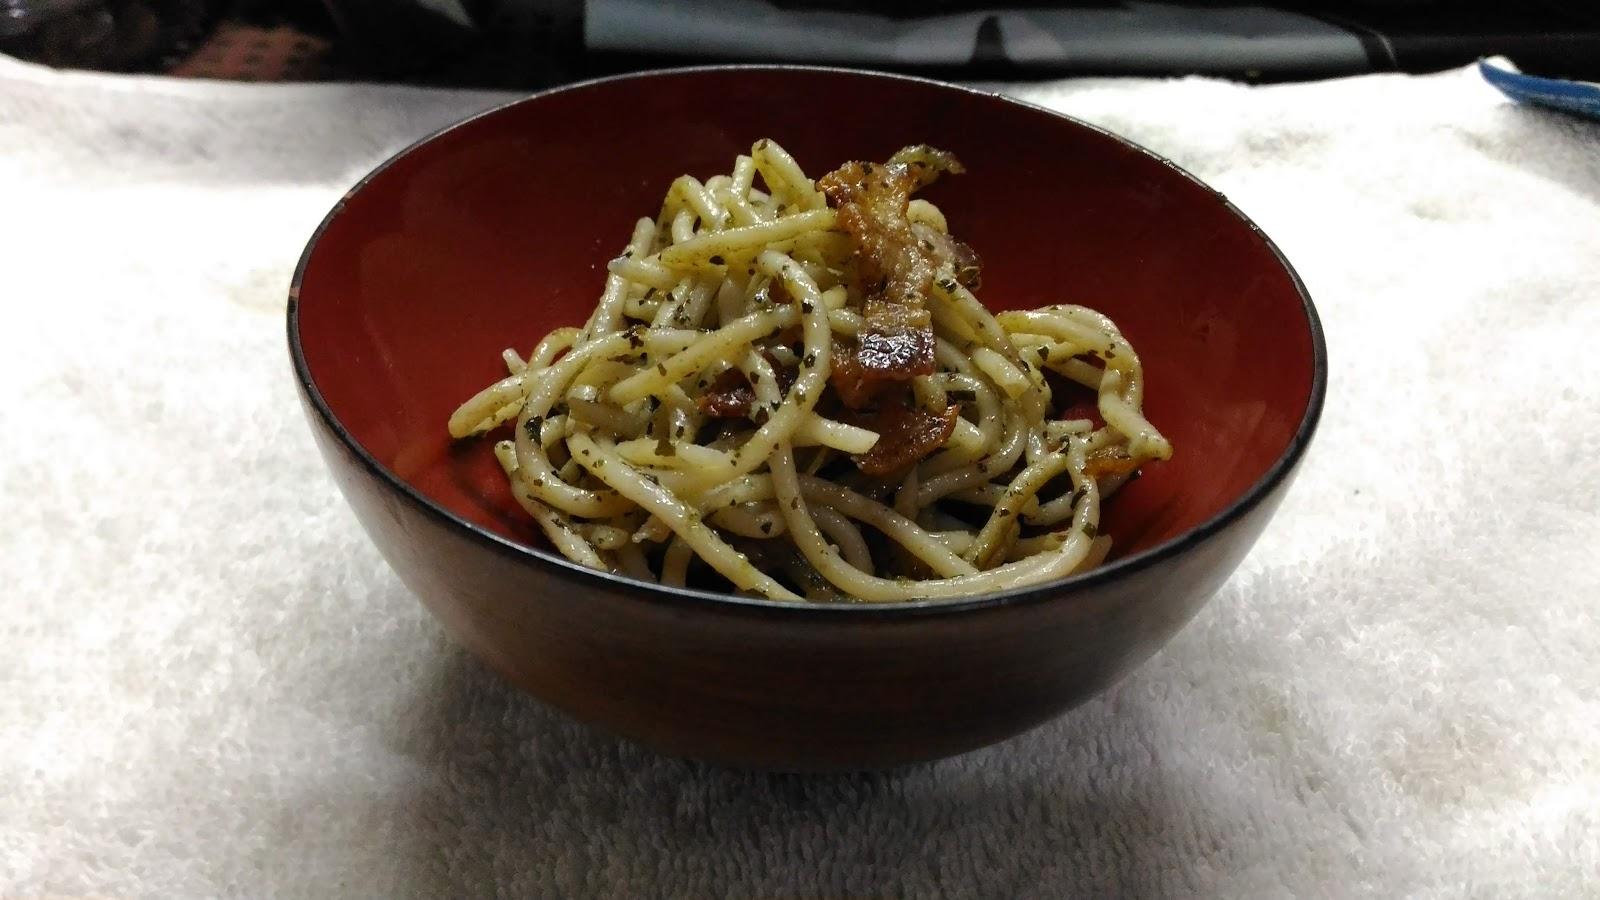 Savory Pesto with Bacon Strips